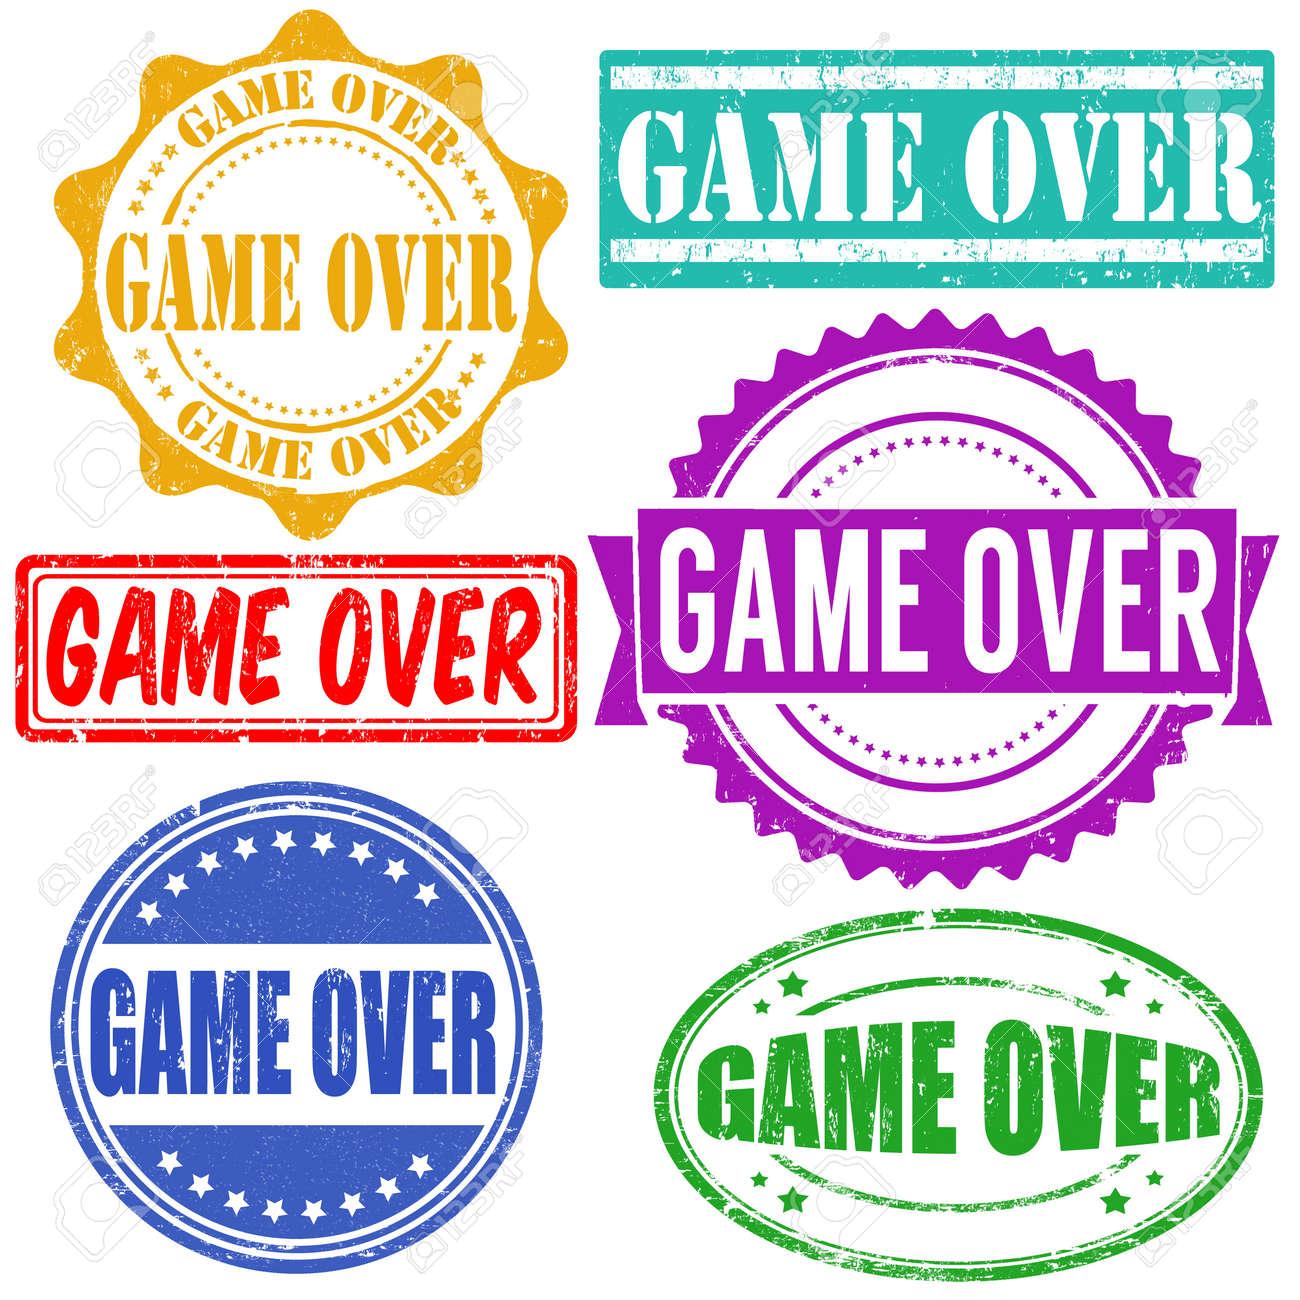 Game over vintage grunge rubber stamps set on white, vector illustration Stock Vector - 25528954